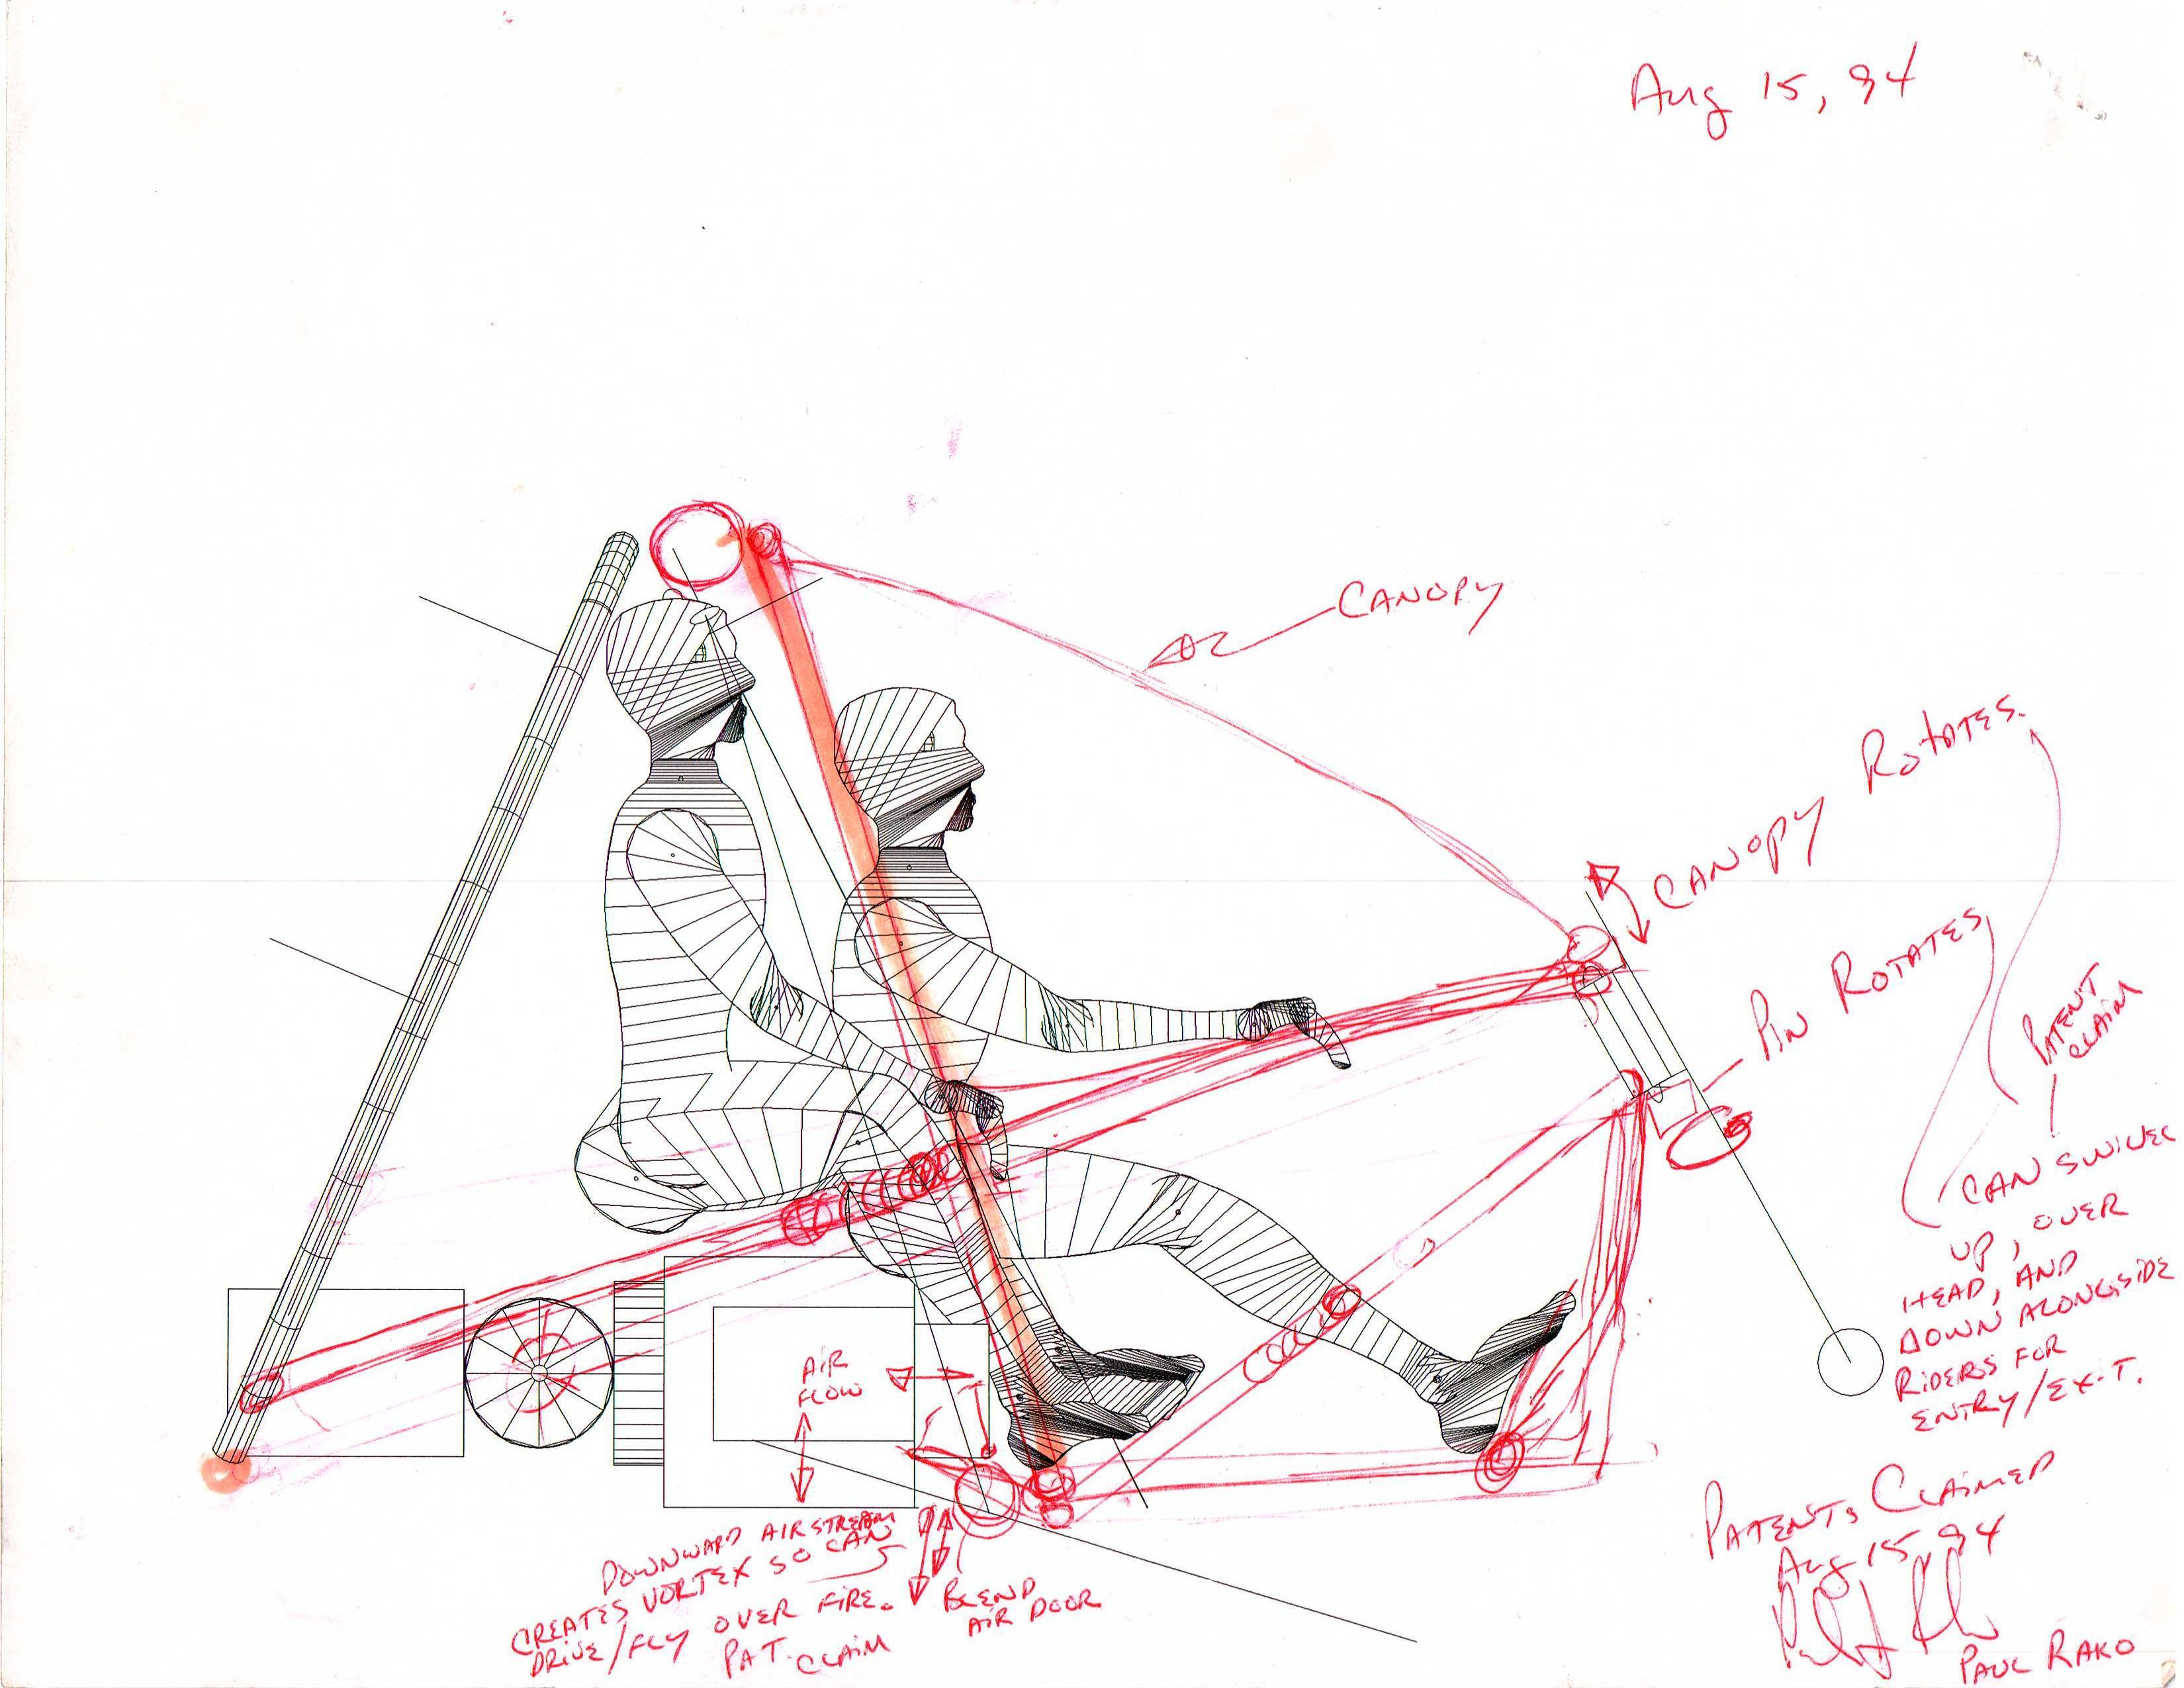 Trike Plane Product Design